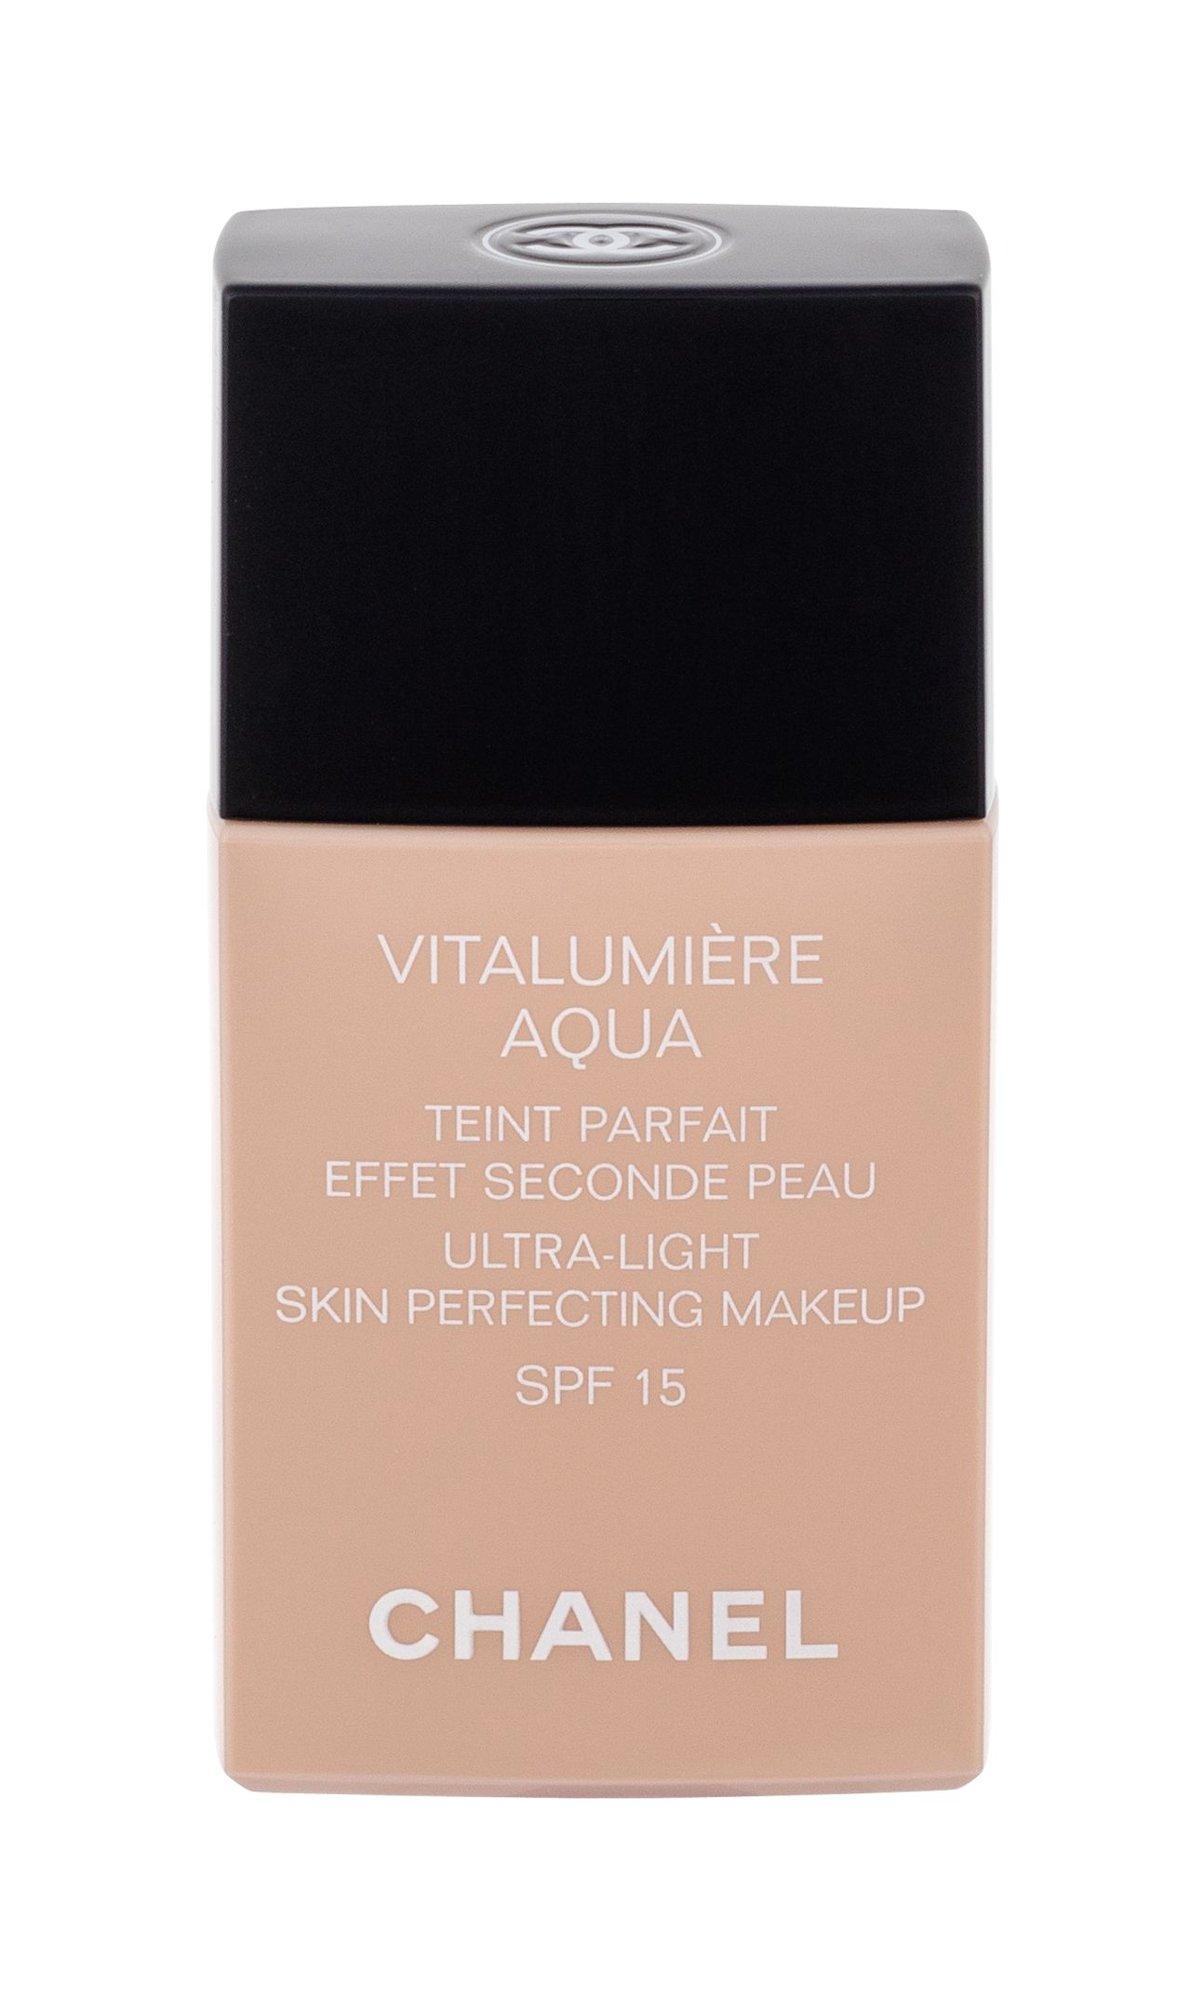 Chanel Vitalumiere Aqua Cosmetic 30ml 20 Beige